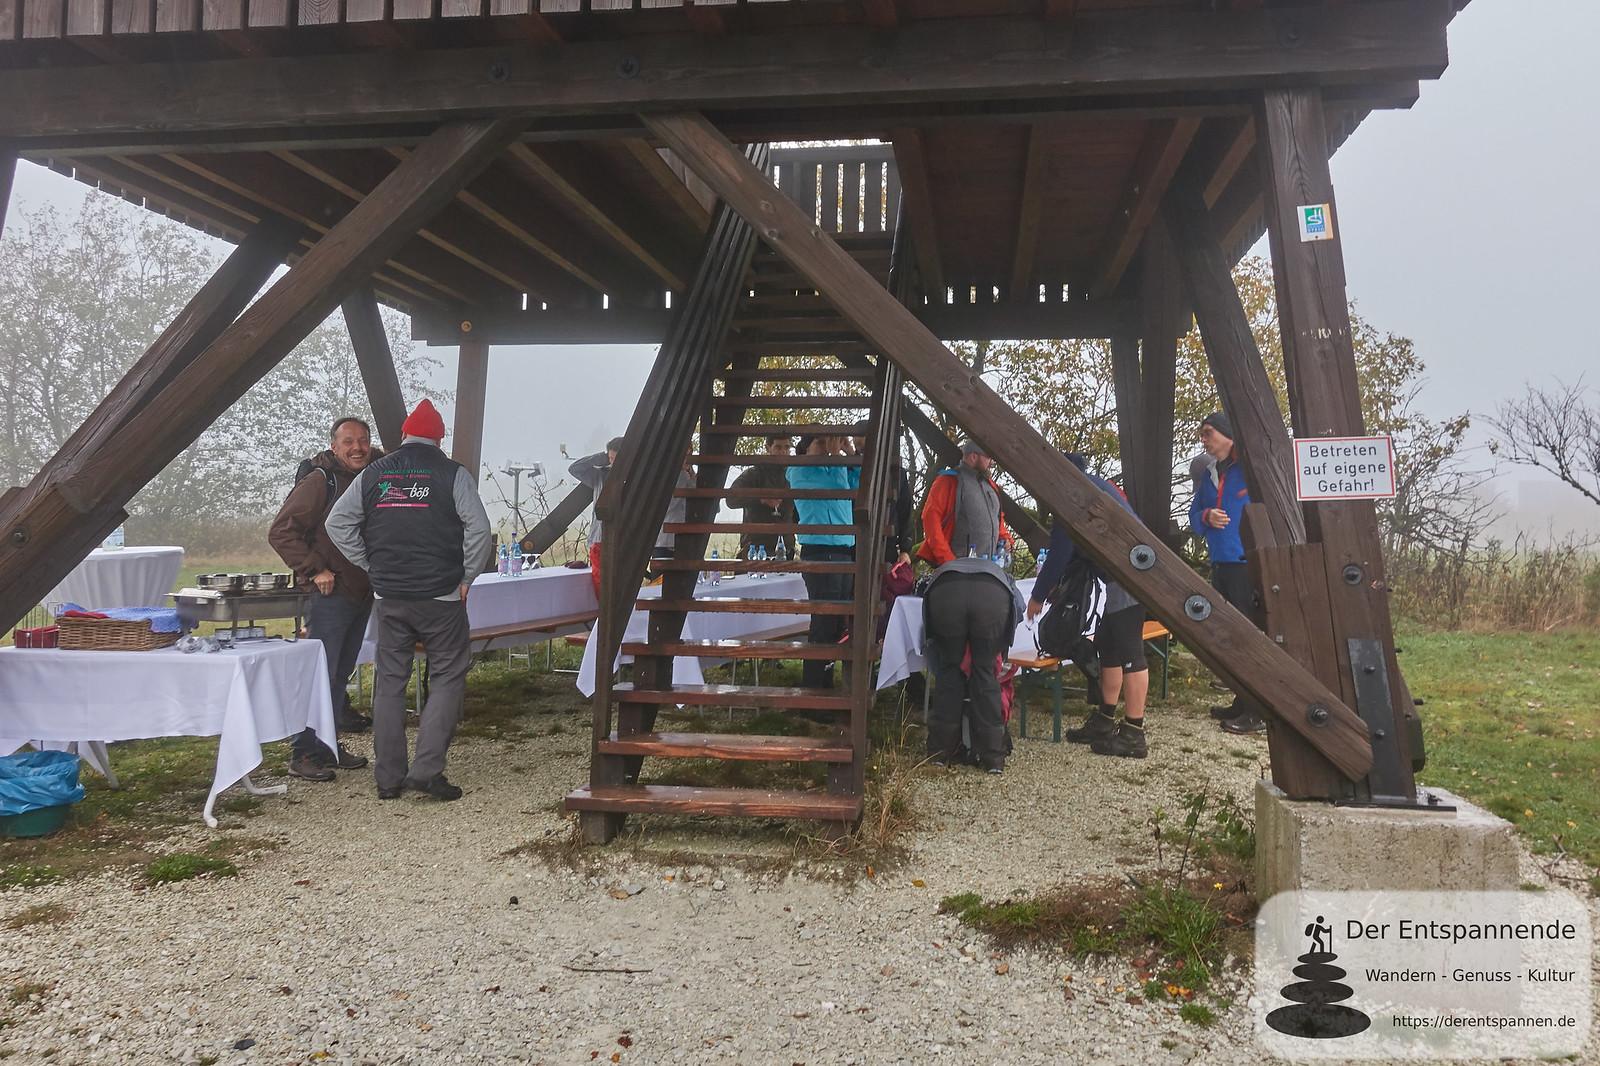 Wanderpause auf dem Erbeskopf, Saar-Hunsrück-Steig, Etappe 10